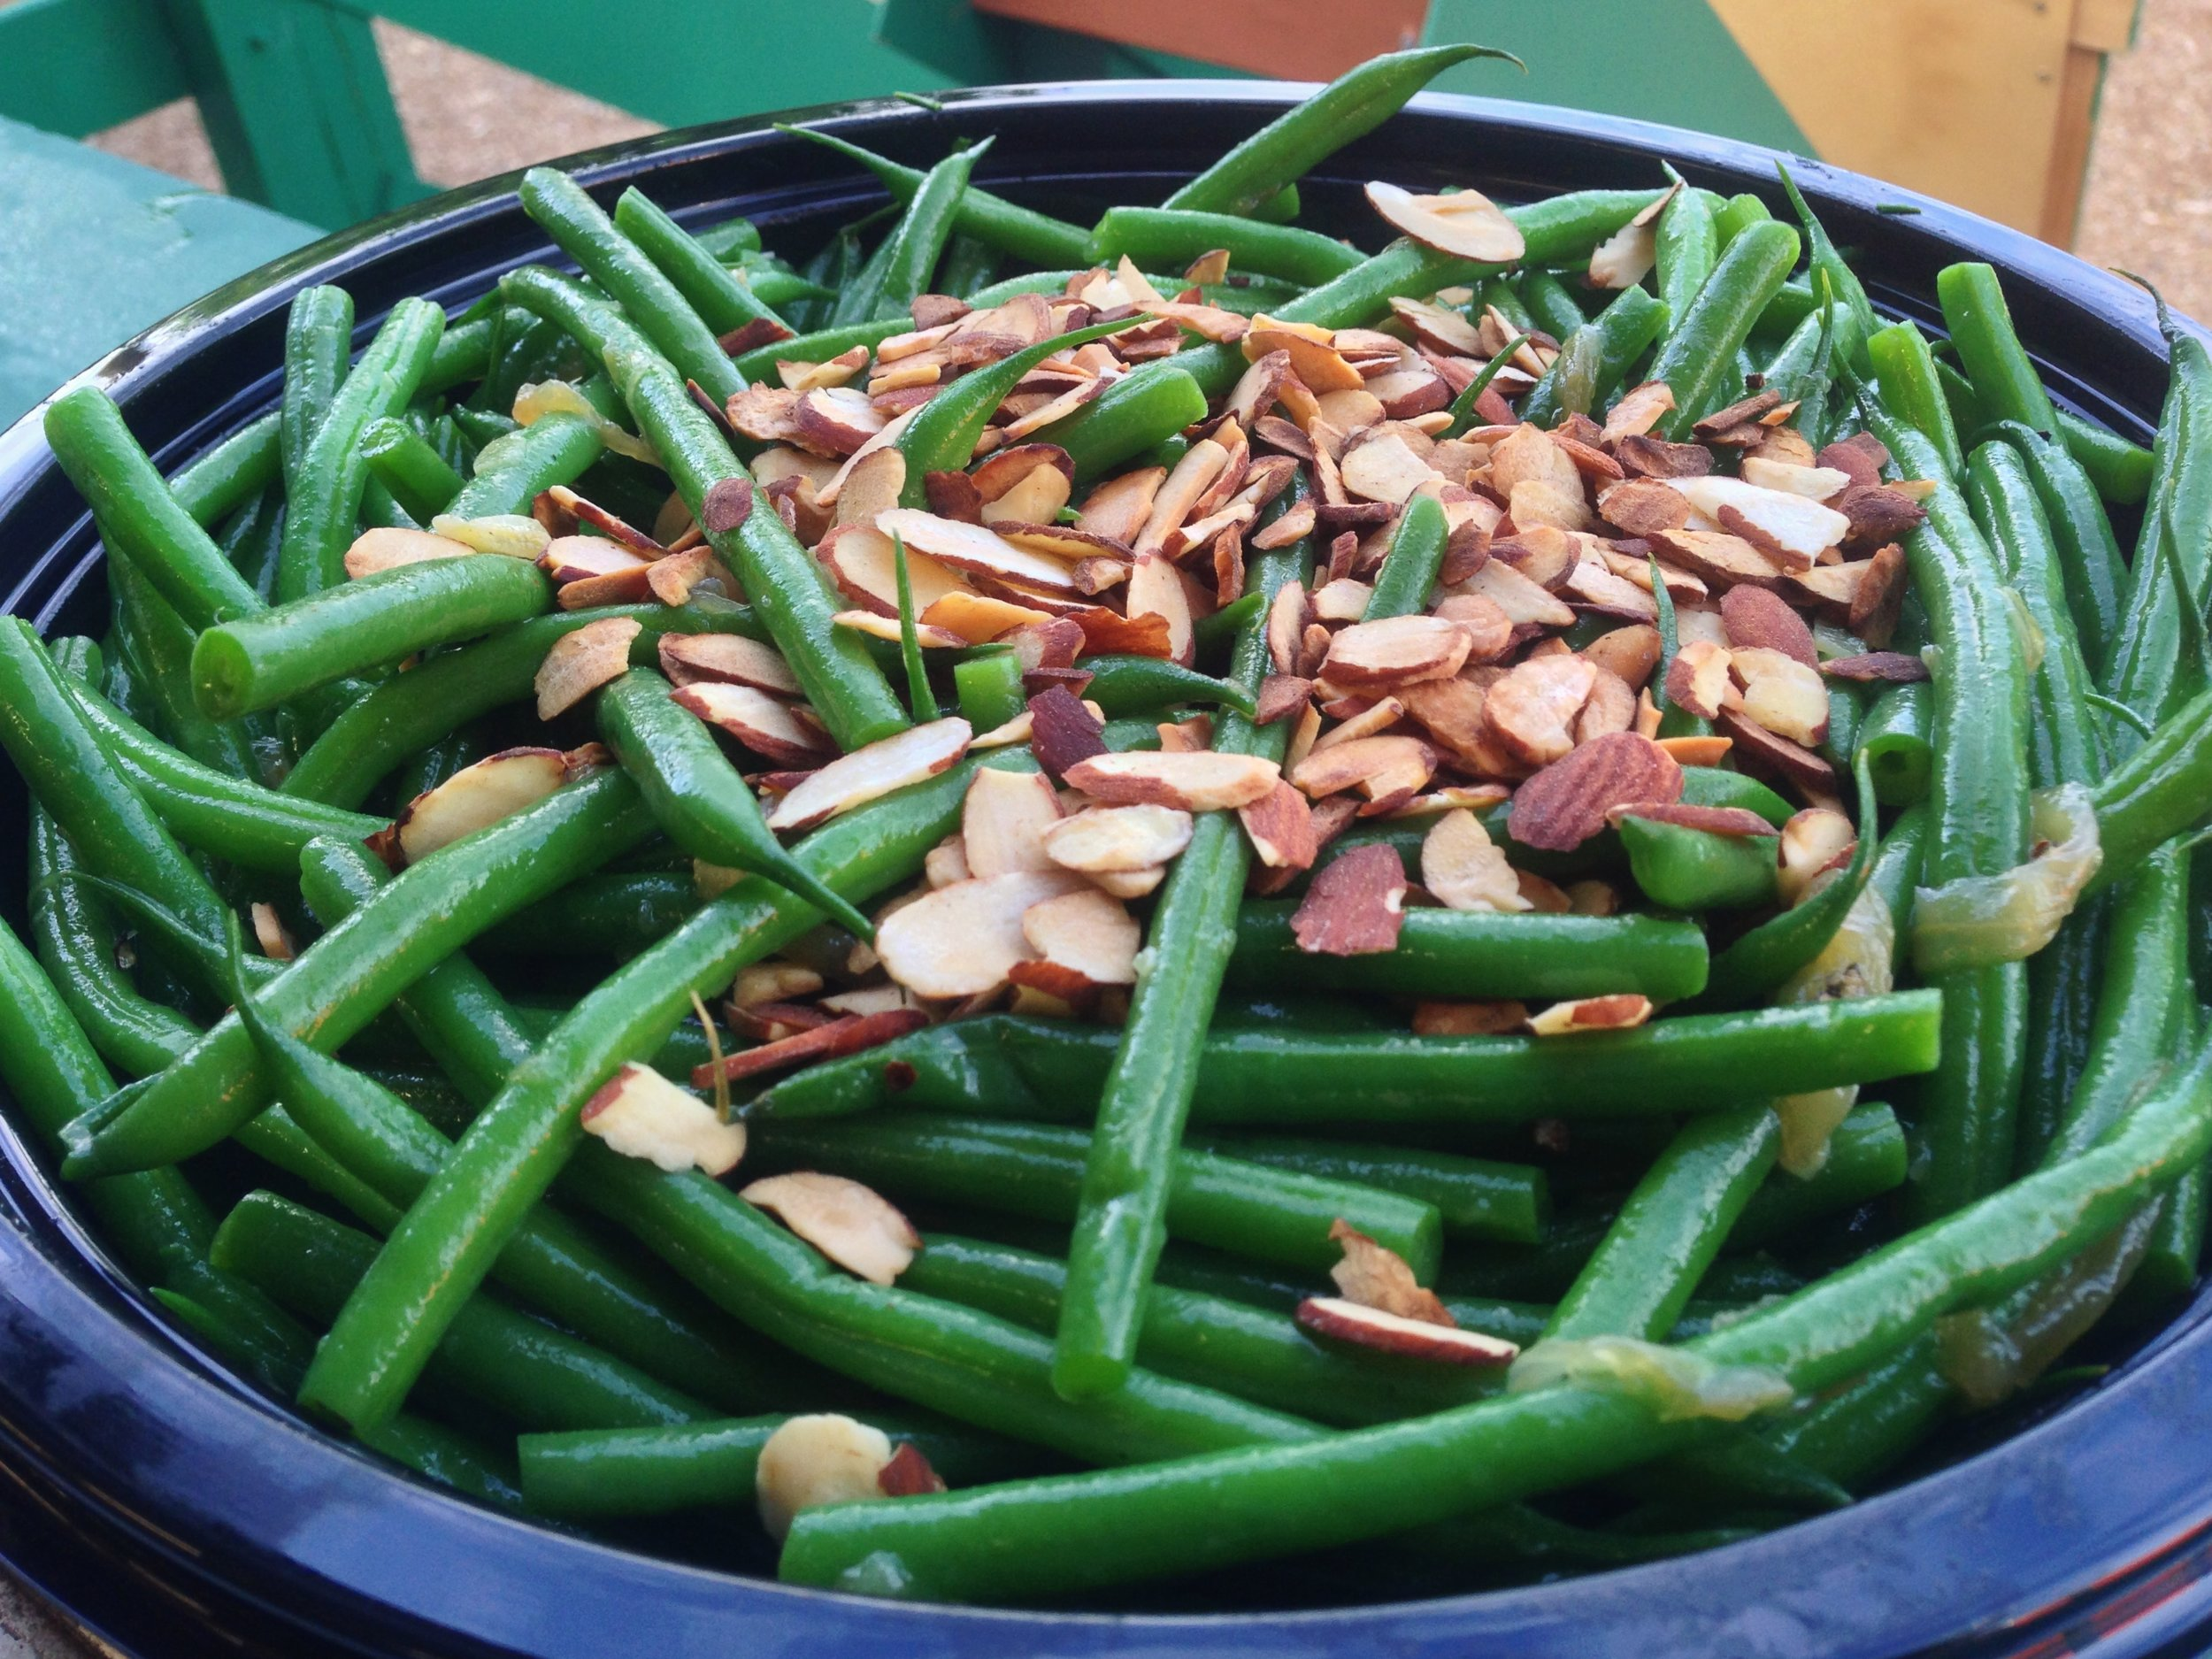 Chilled Green Bean Salad Gregorios.jpg